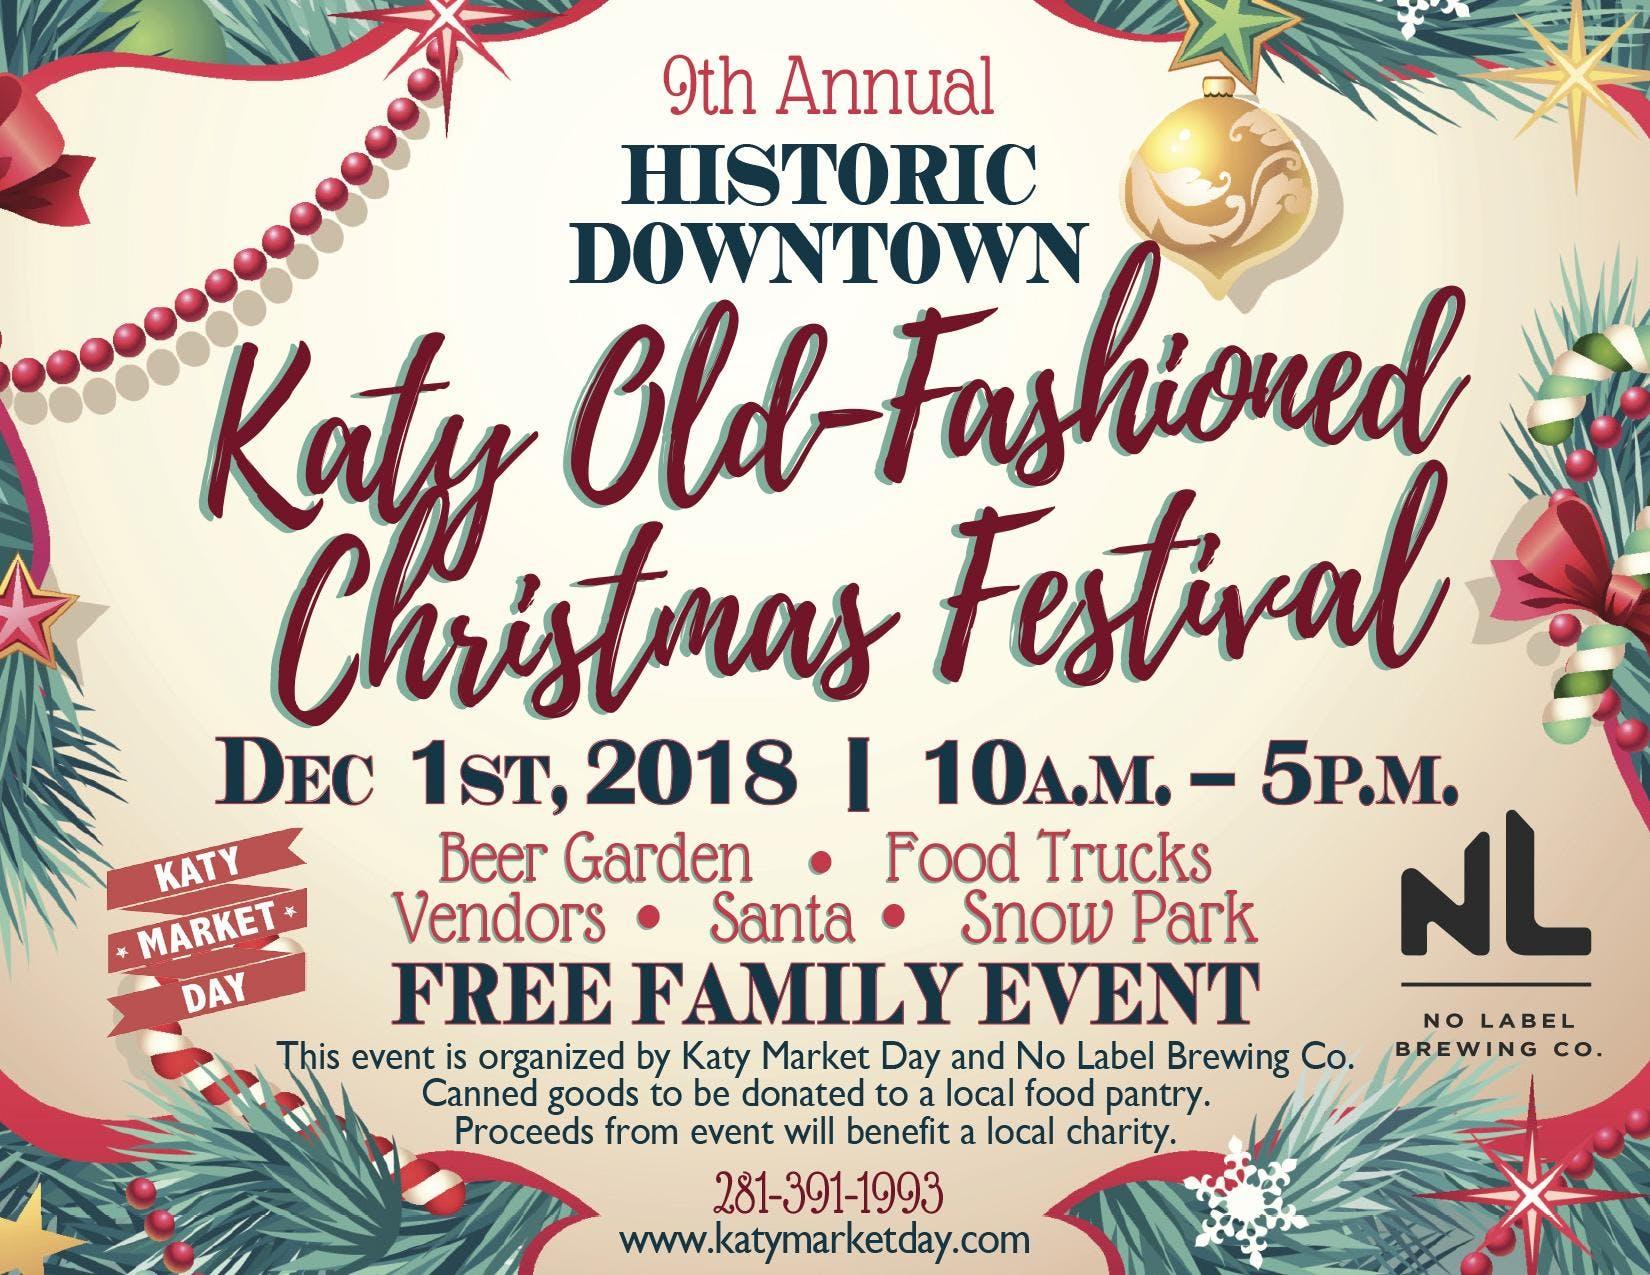 Katy Old-Fashioned Christmas Festival - 9th Annual - 1 DEC 2018